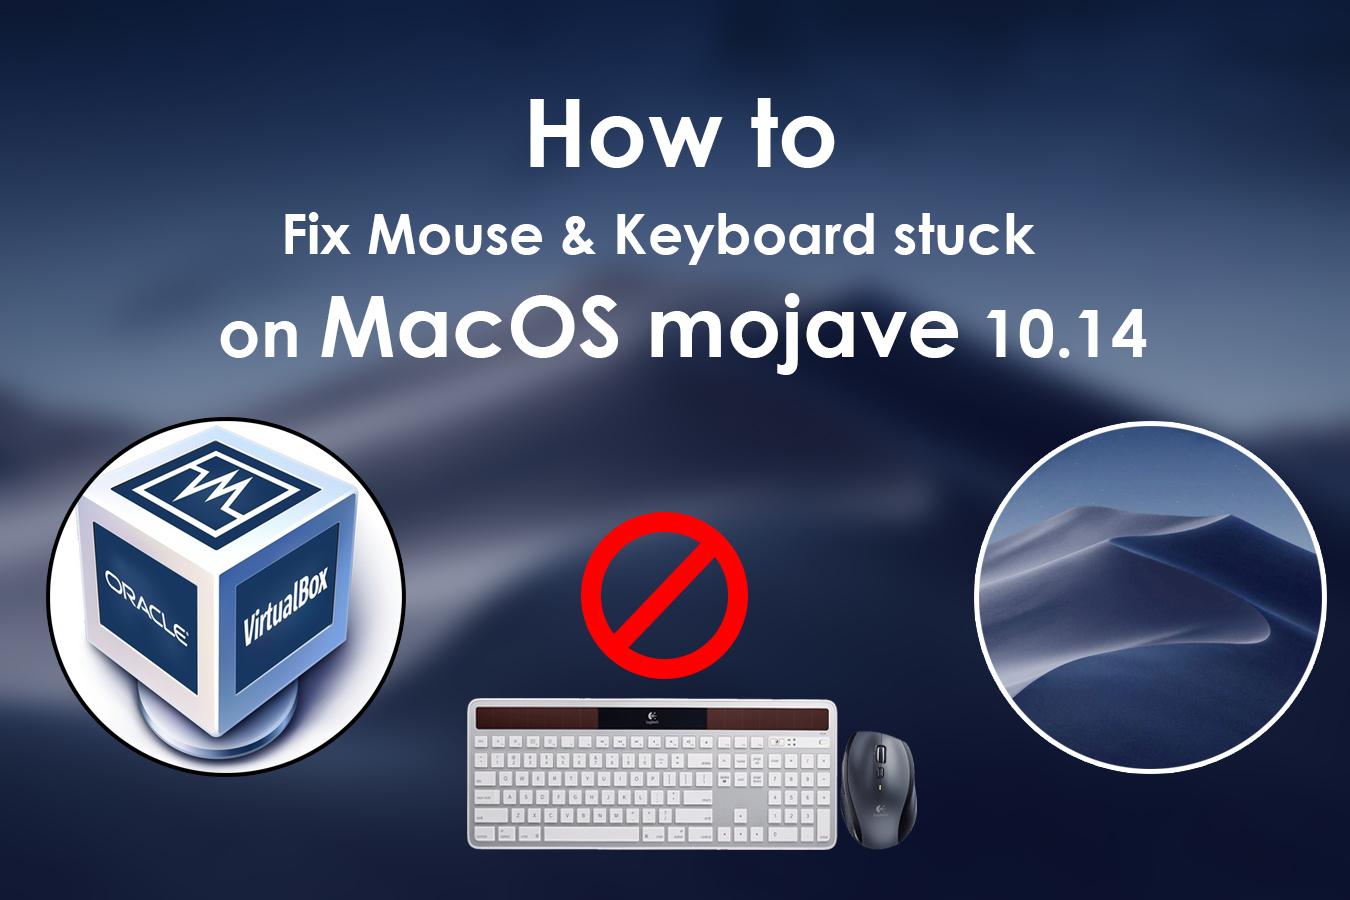 Mac Os X Mojave Update Stuck MacOS Catalina Stuck on install